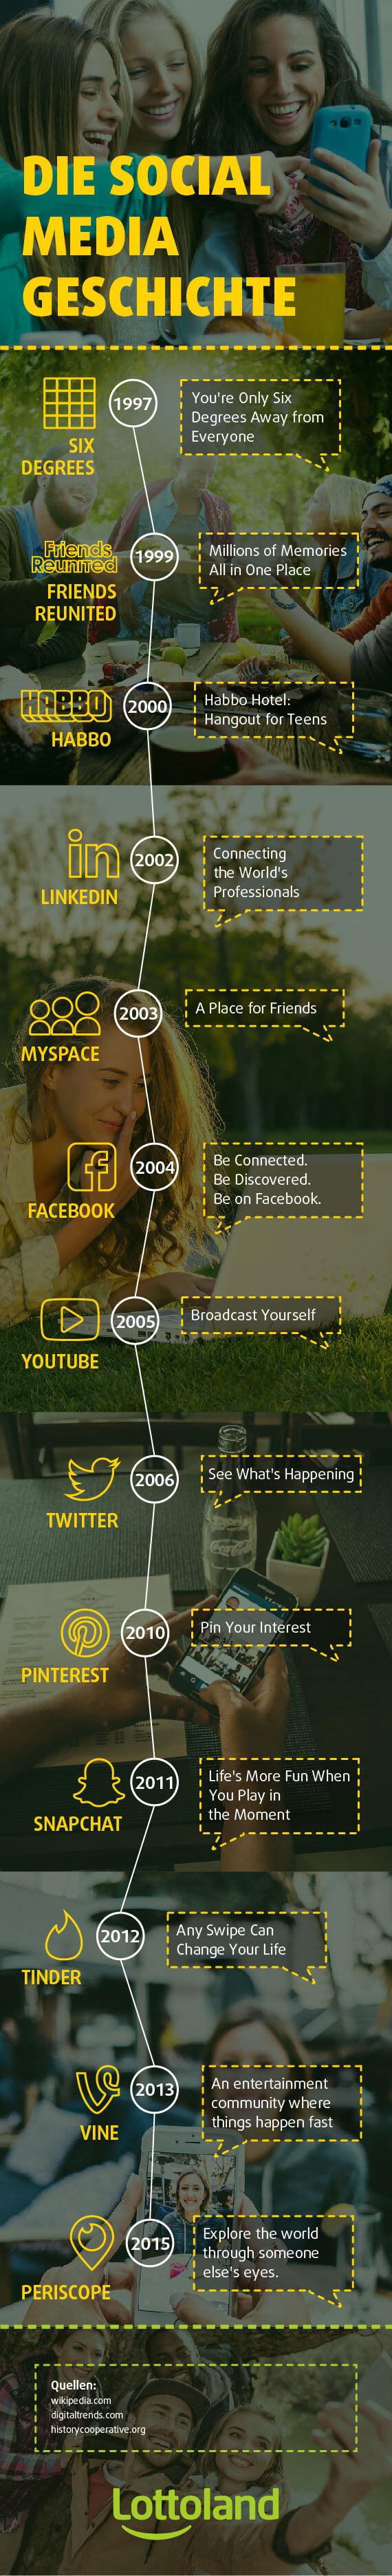 Die Social Media Geschichte